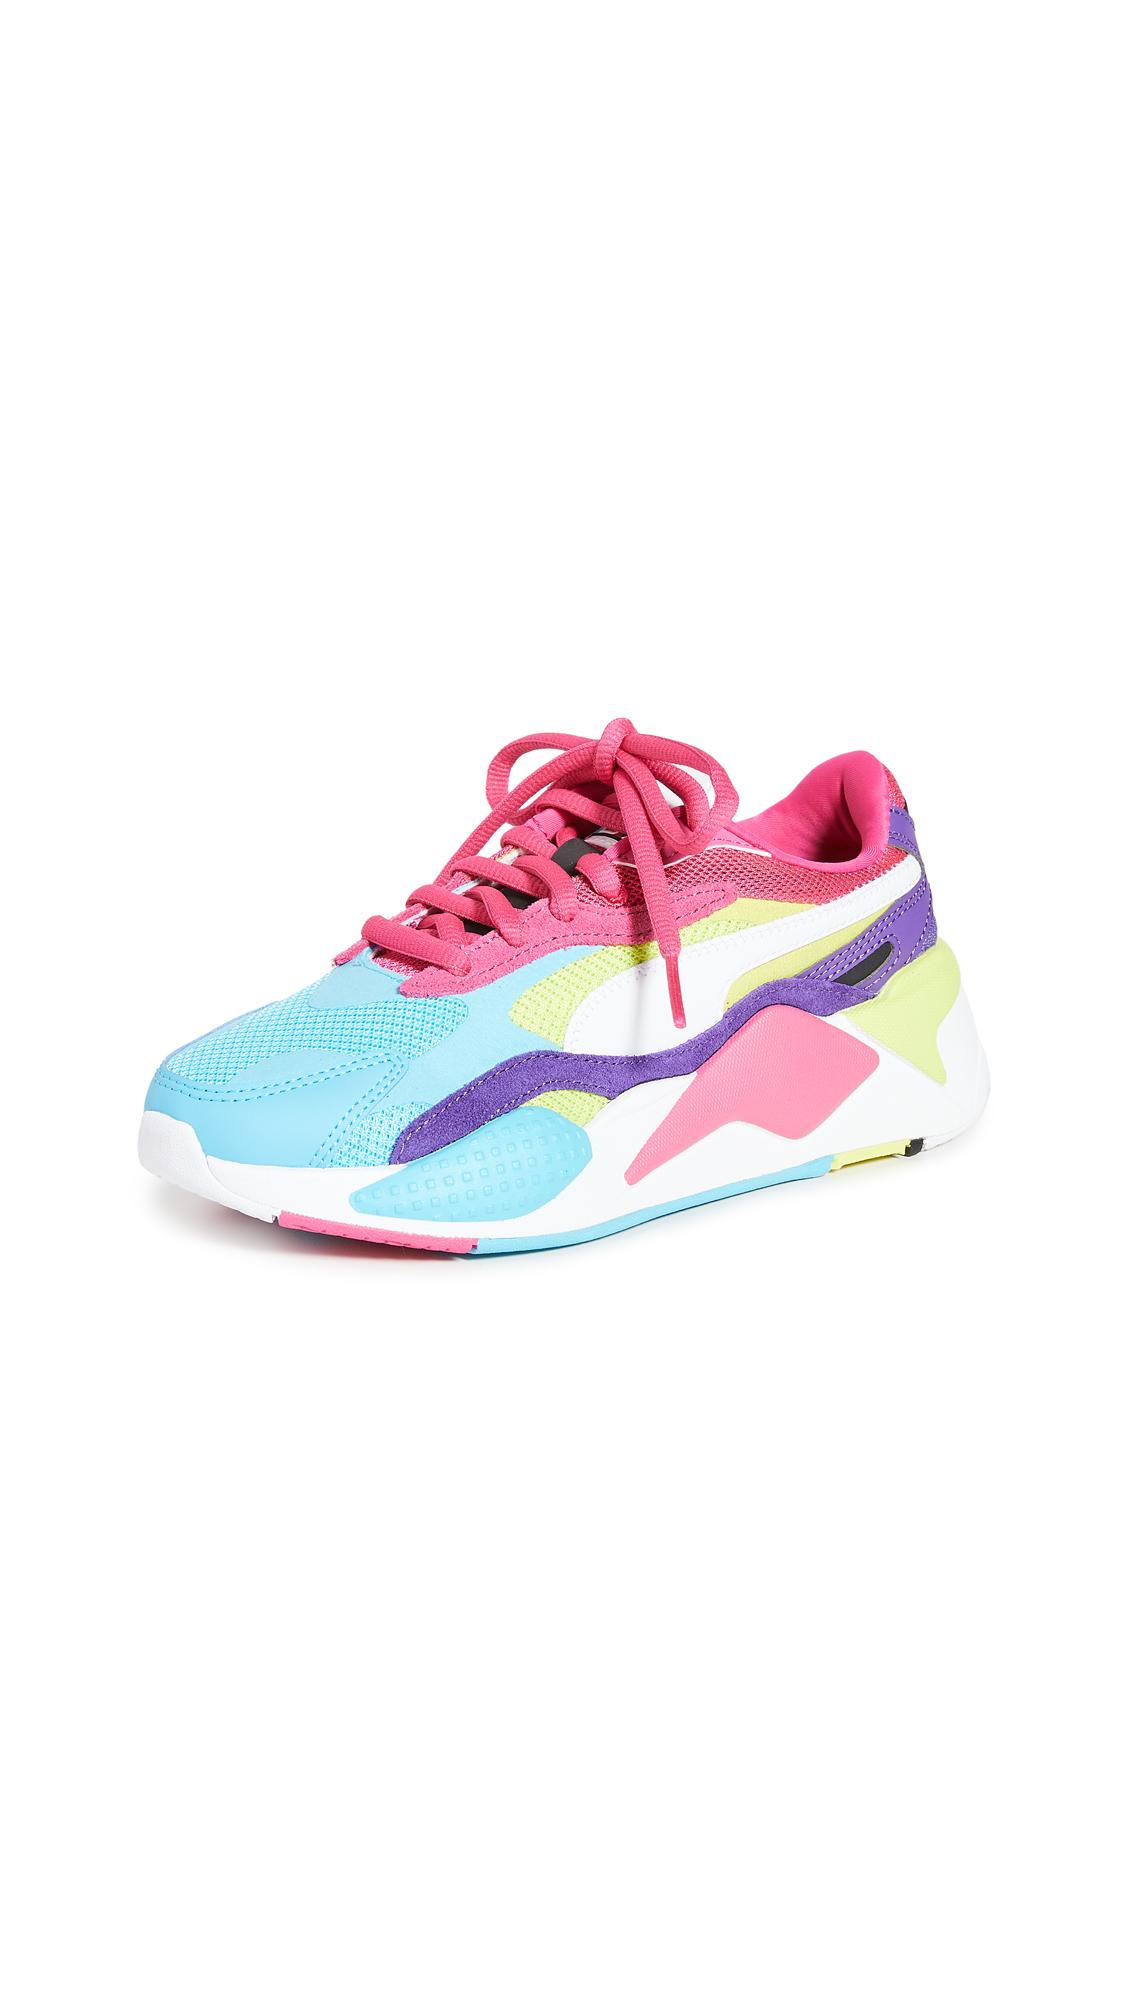 Buy PUMA RS-X3 PNA Specific Rubix Cube Sneakers online, shop PUMA